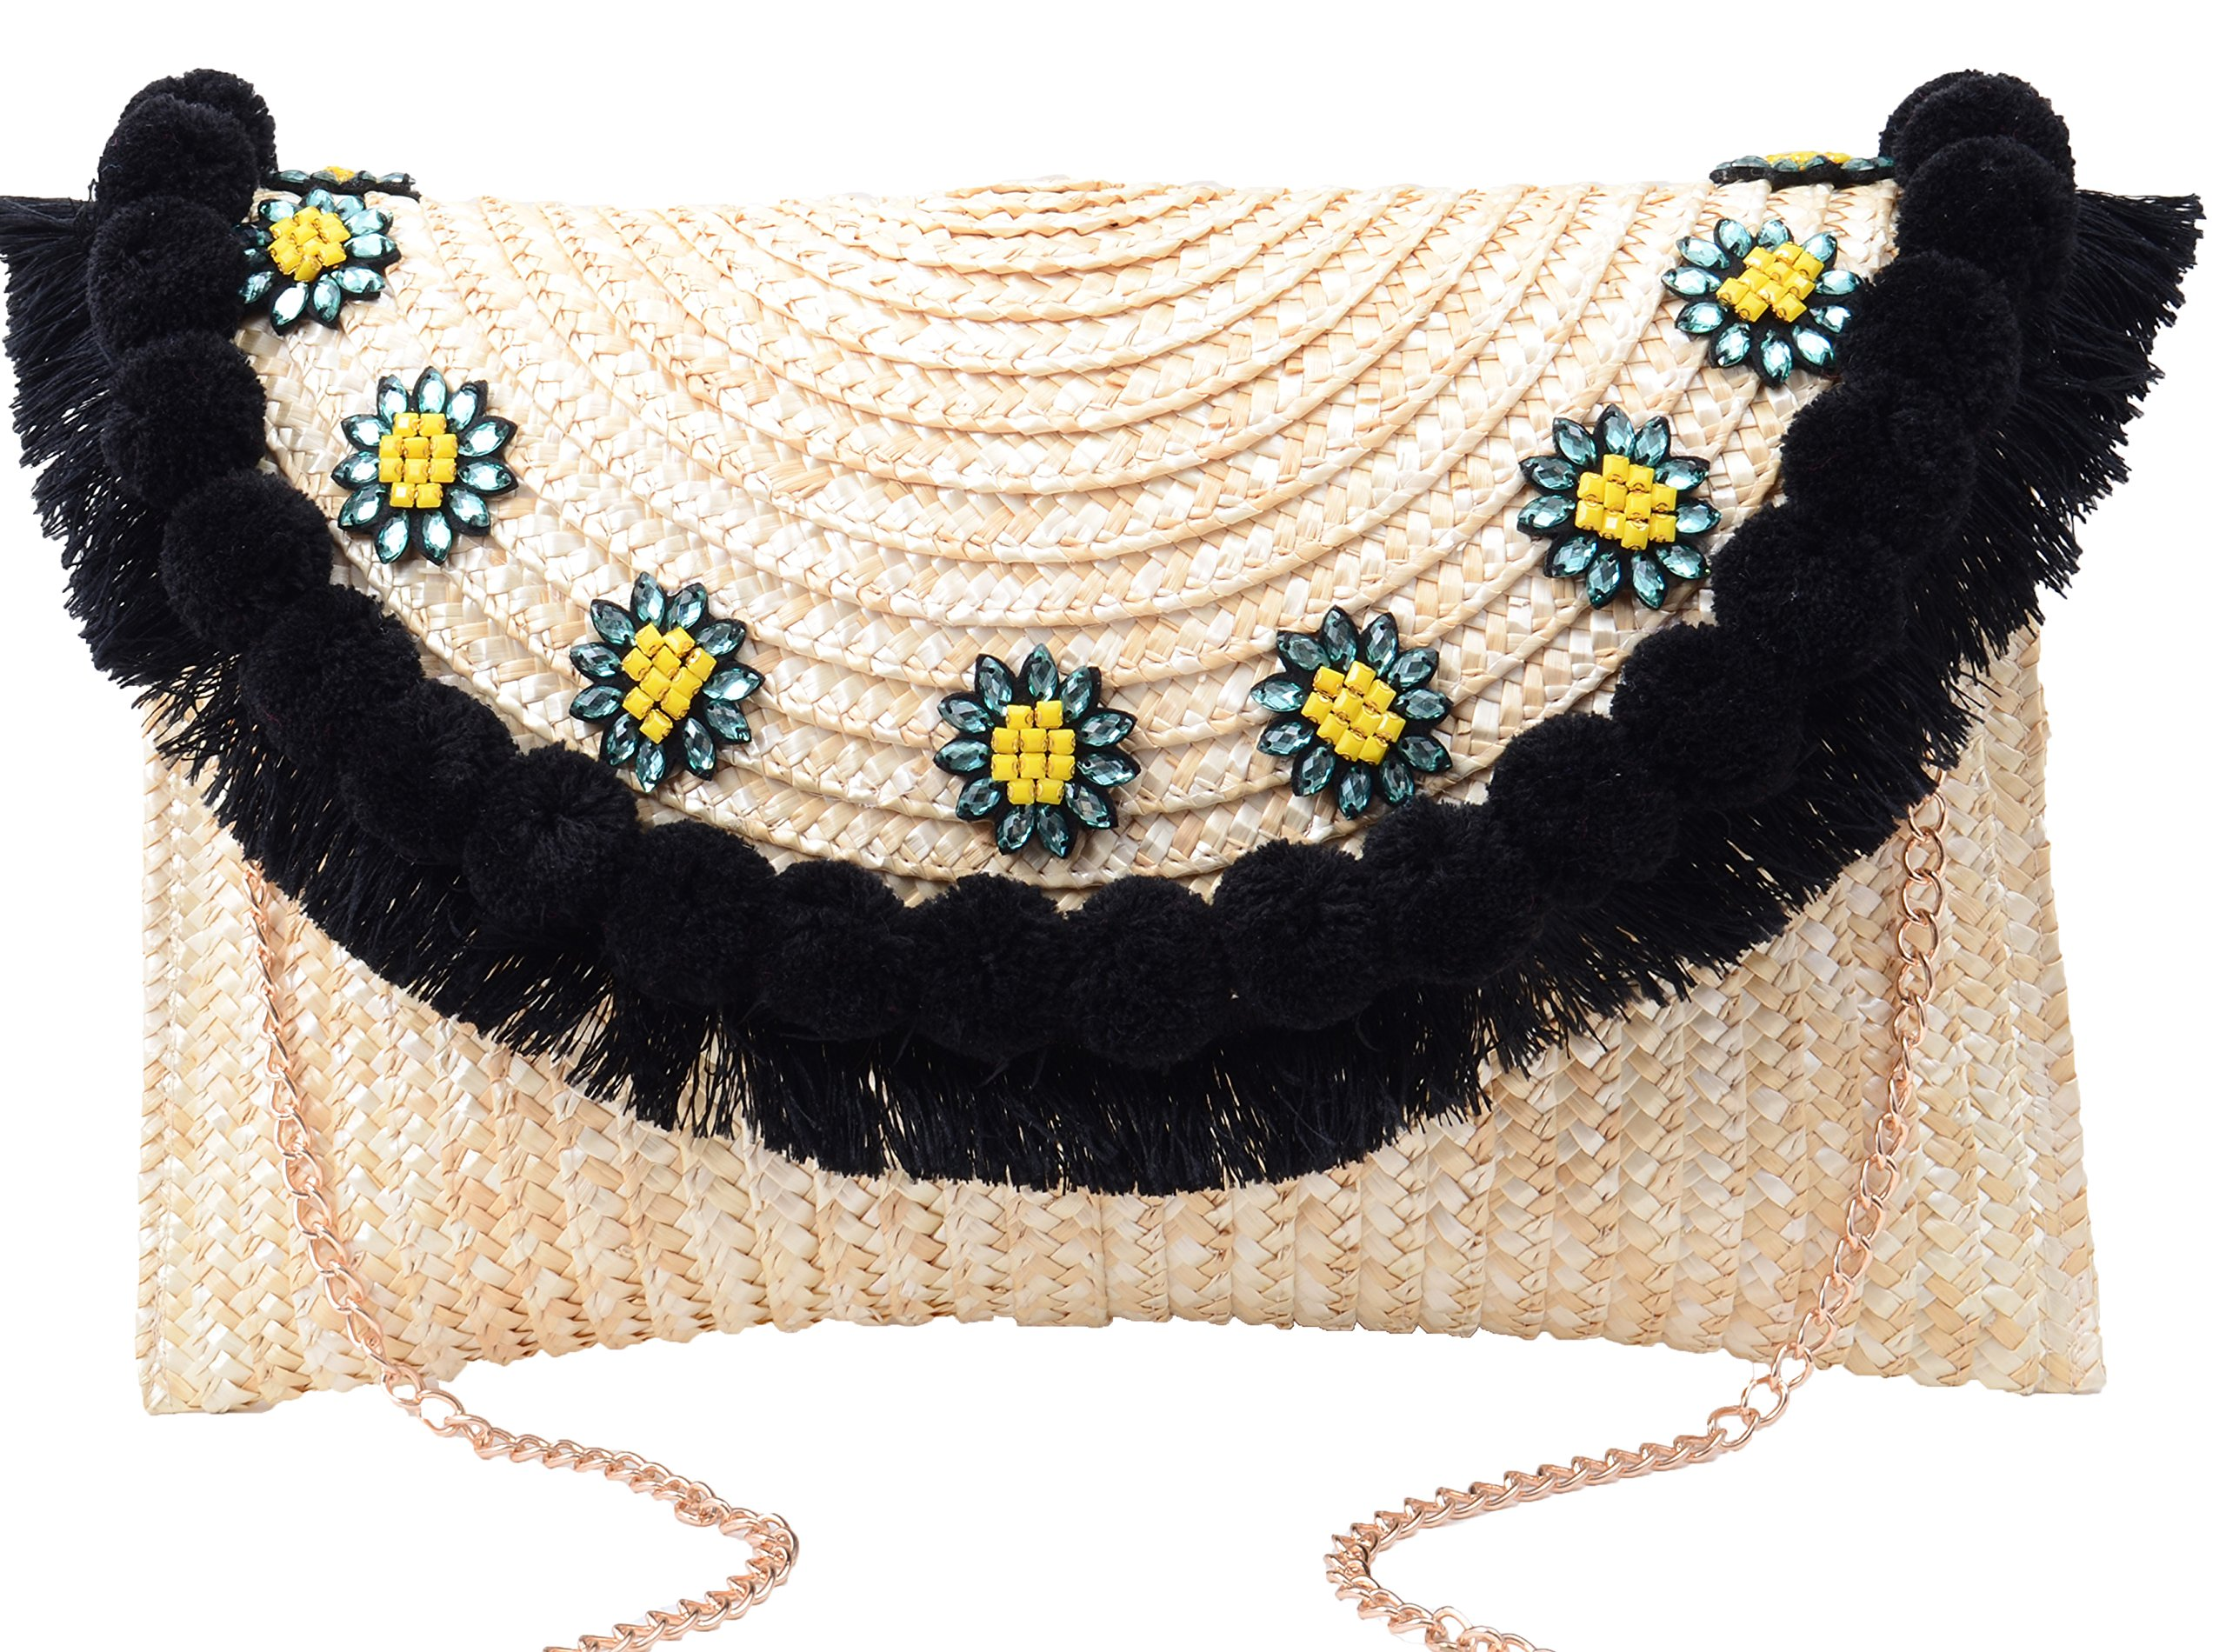 Pulama Straw Crossbody Crochet Shoulder Bag Pom Pom Tassel Pinapple Fringe Fashion Clutch Ivory by Pulama